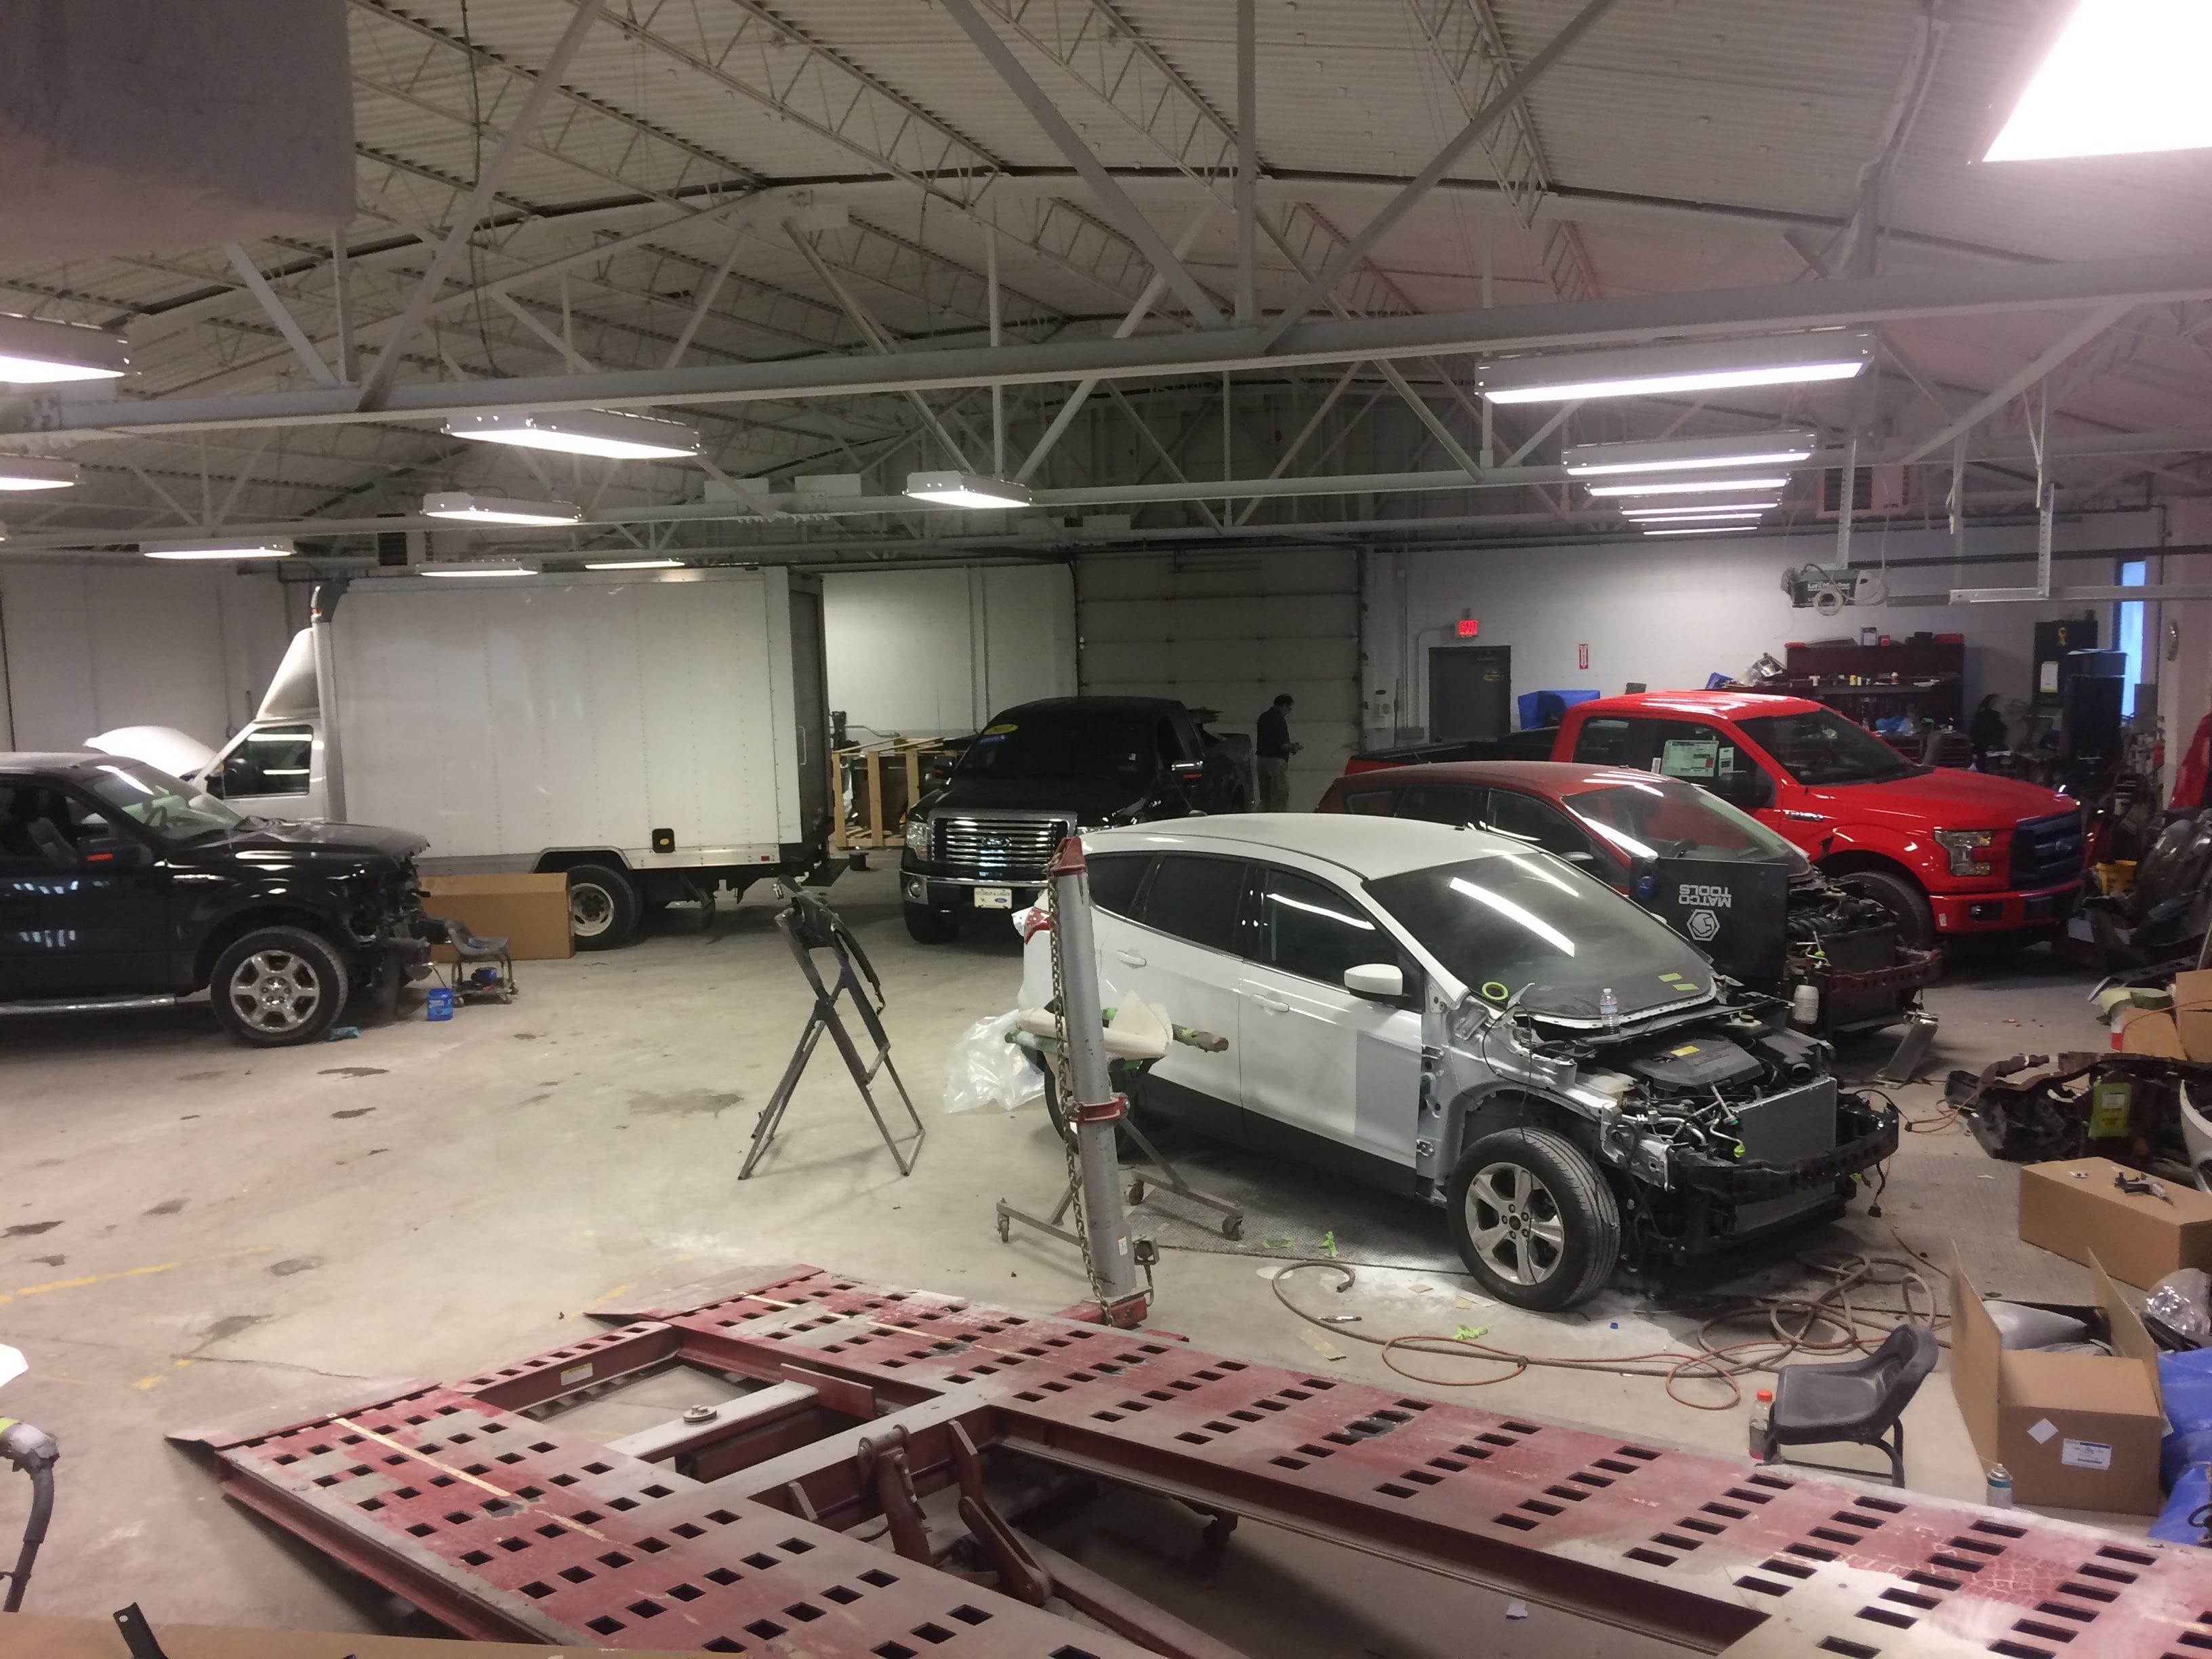 Sturman Larkin Ford Inc New Ford Dealership In Pittsburgh PA - Car show pittsburgh pa